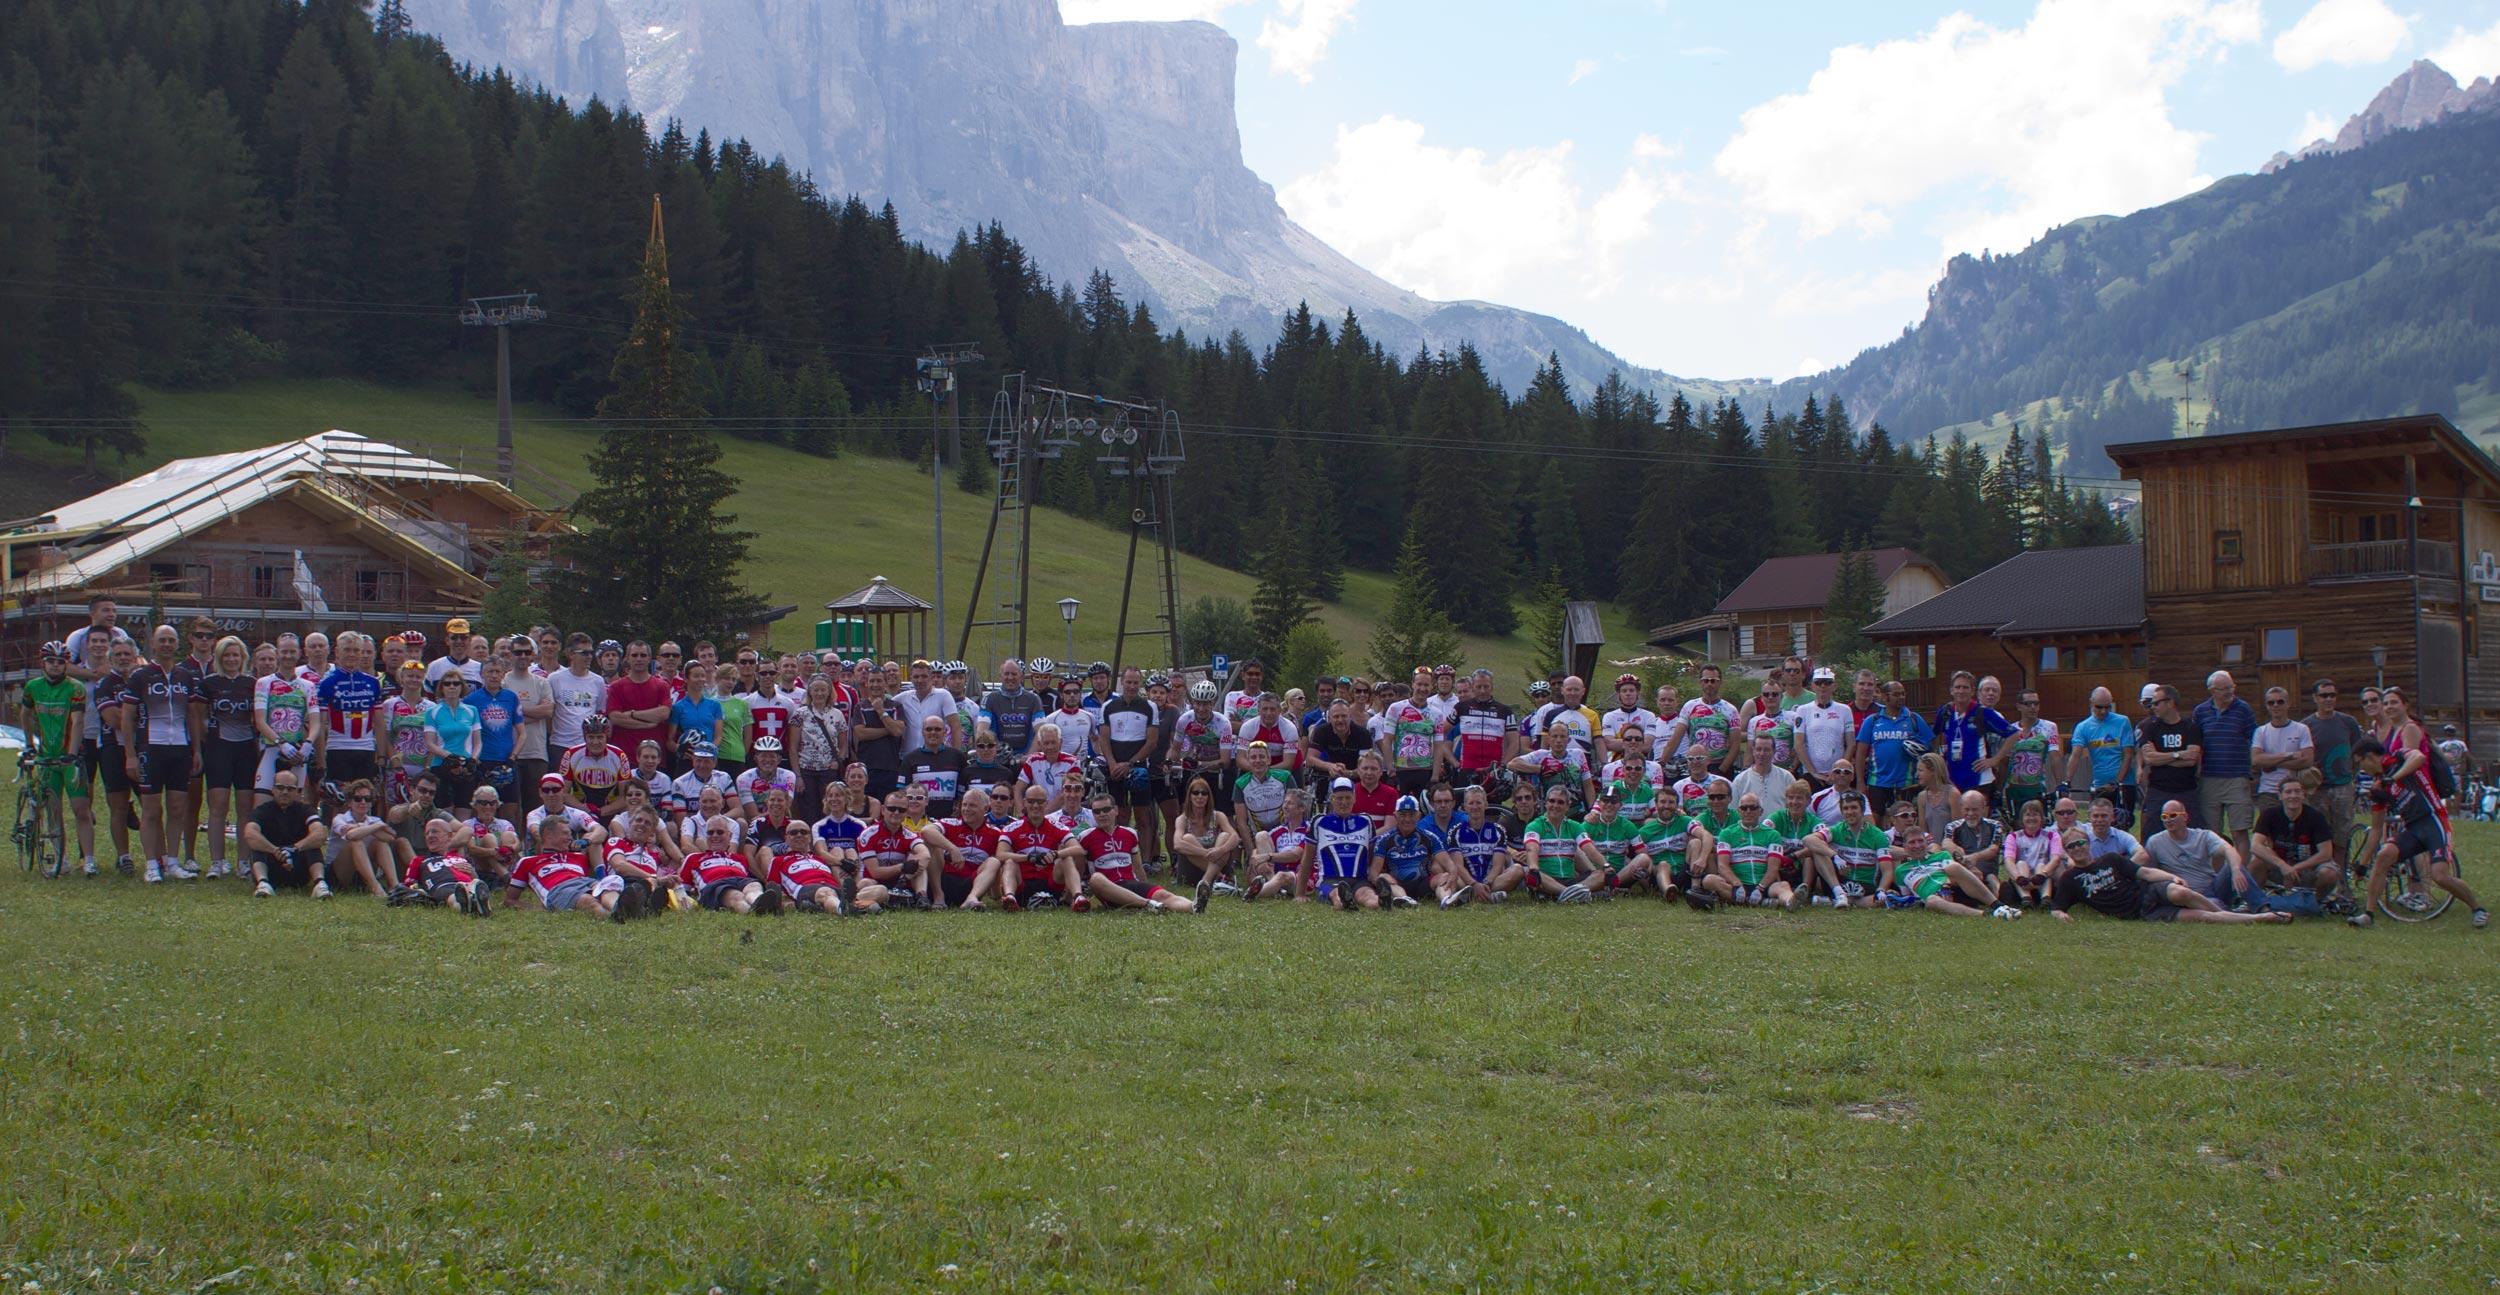 Cycling Weekly group, Maratona dles Dolomites 2011